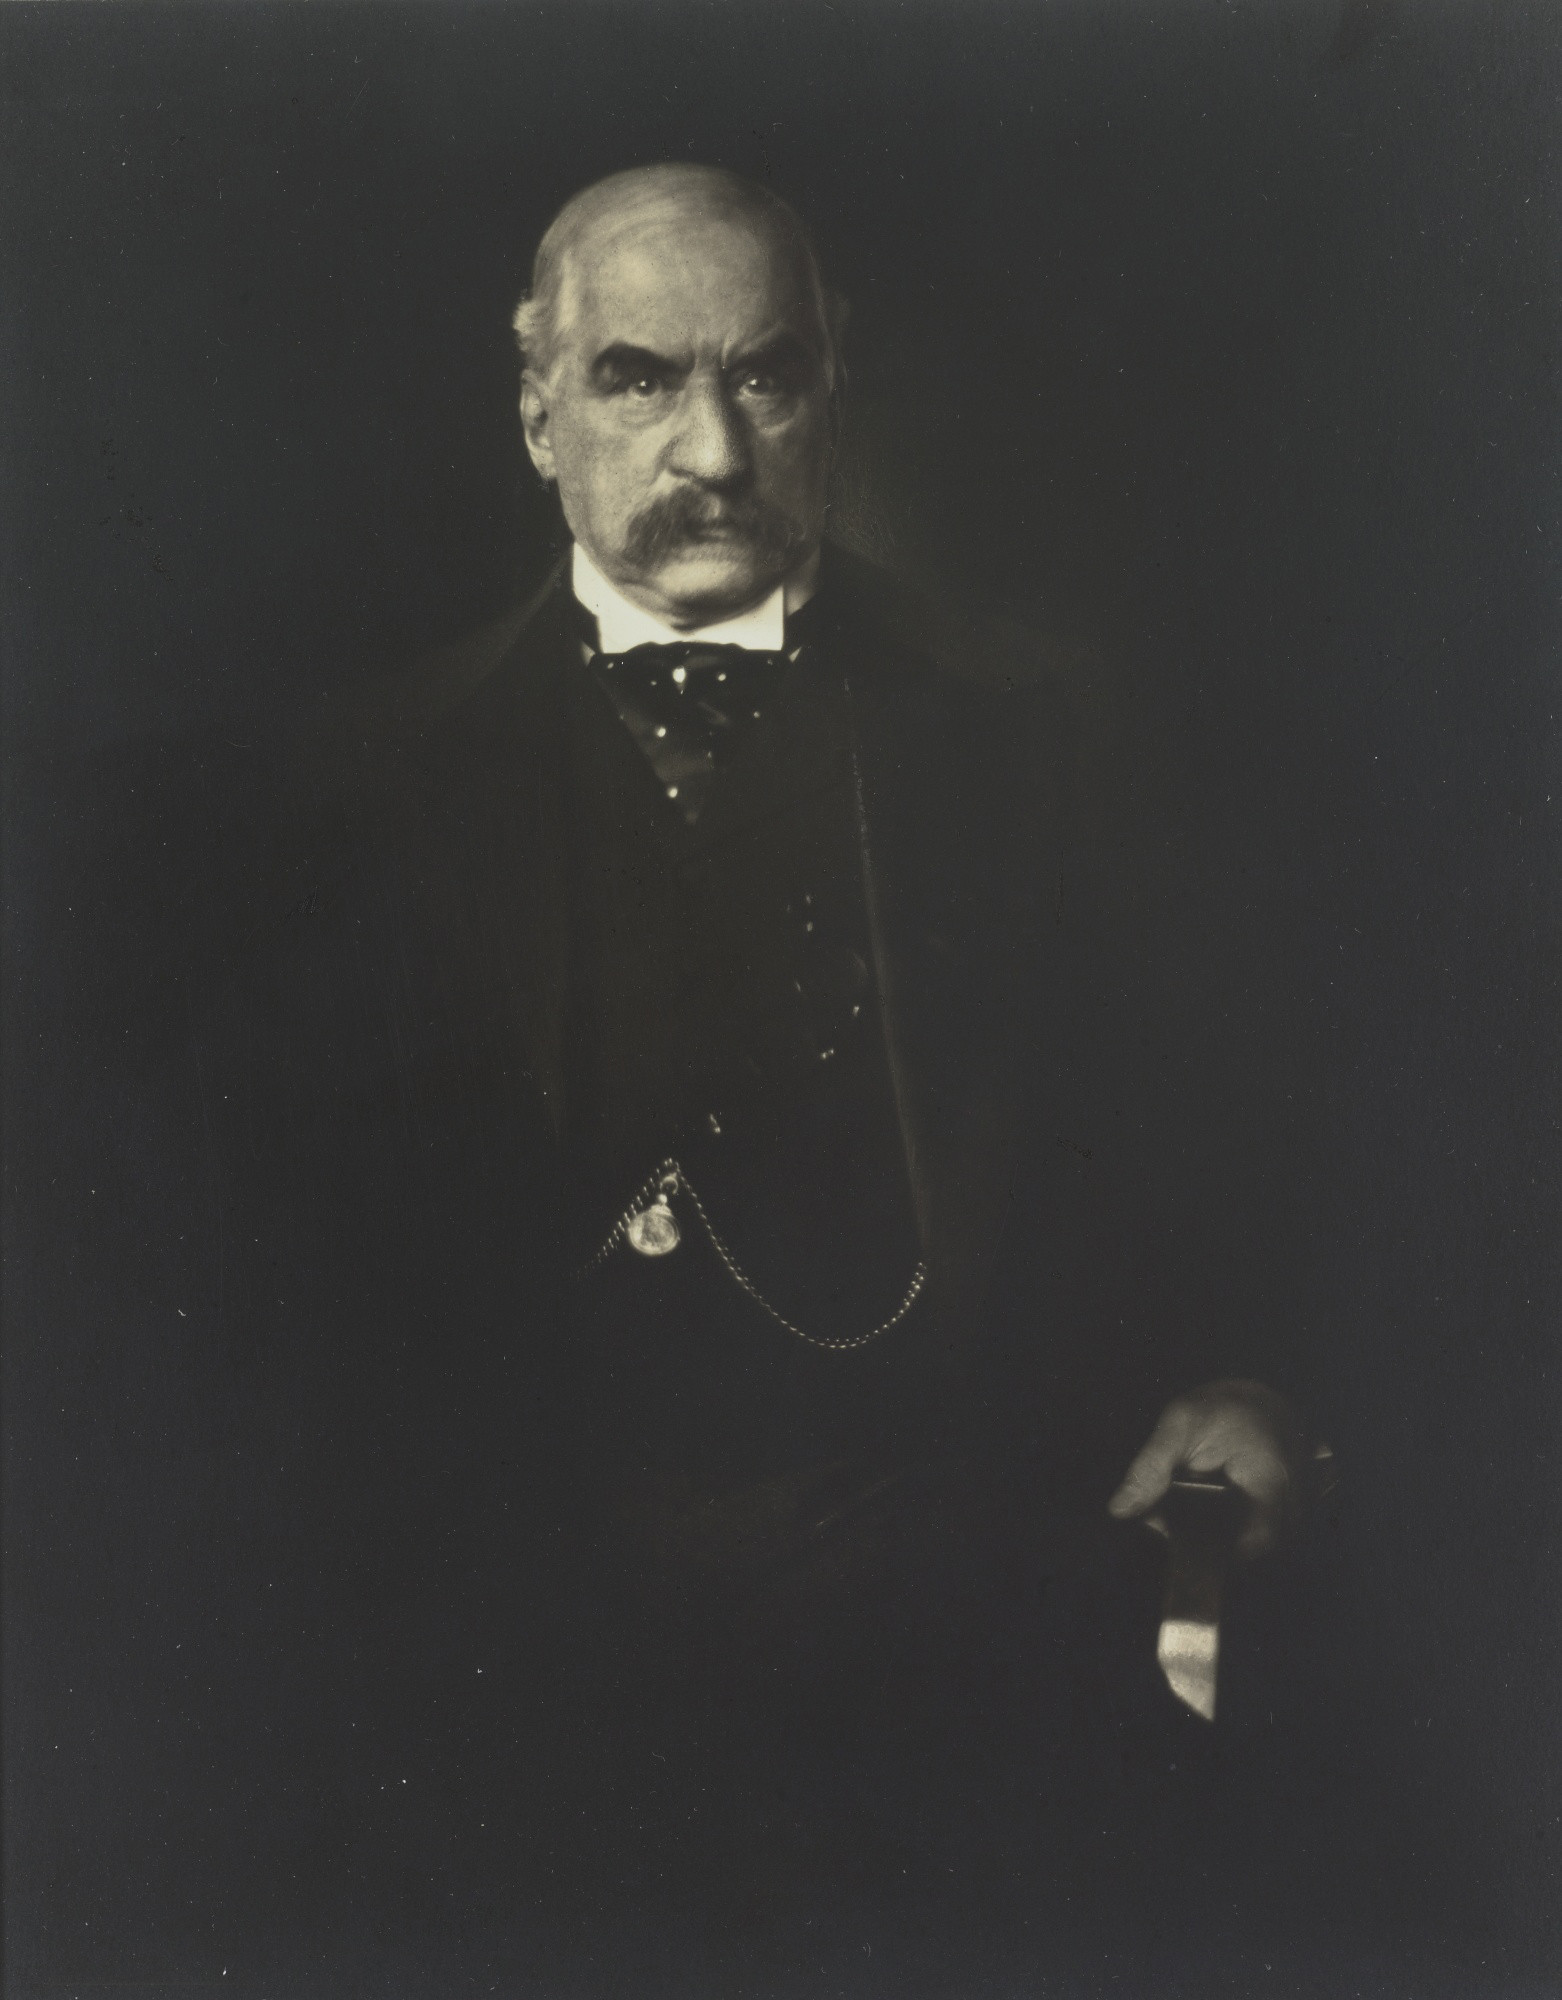 ▲▼J.P. Morgan(圖/翻攝自Wikipedia)